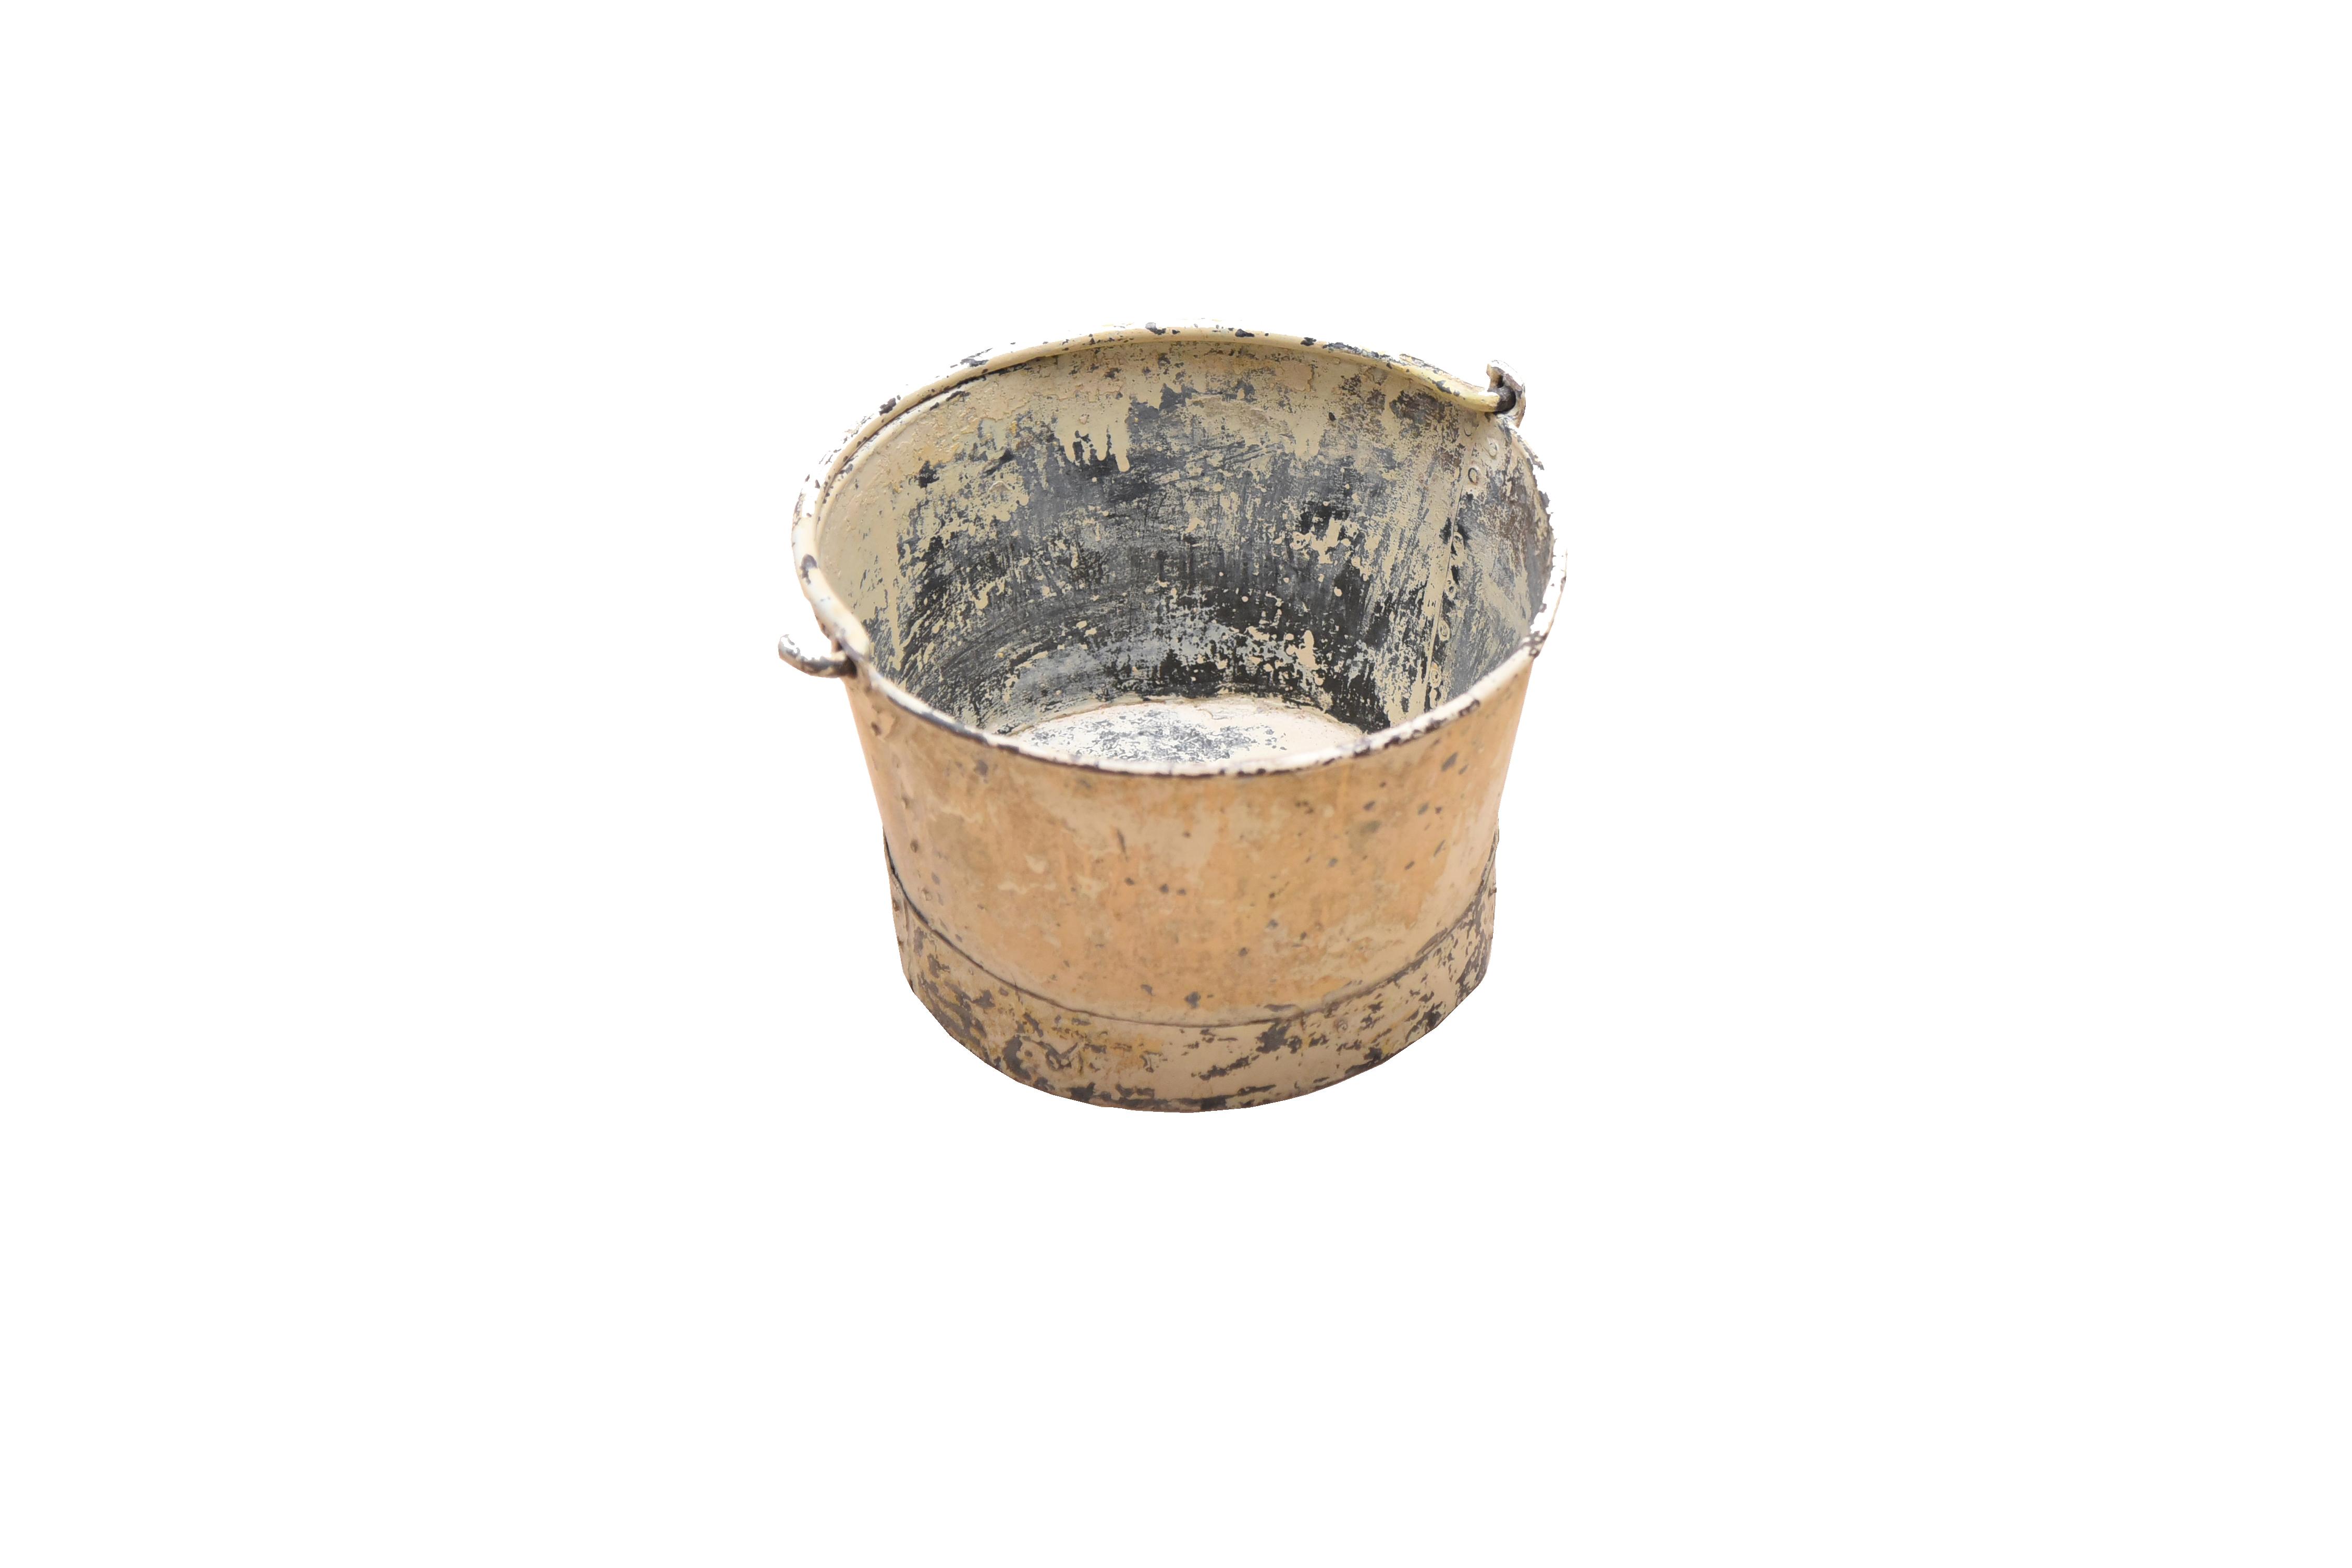 ANRA1836 - 25 x 25 x 20 cm